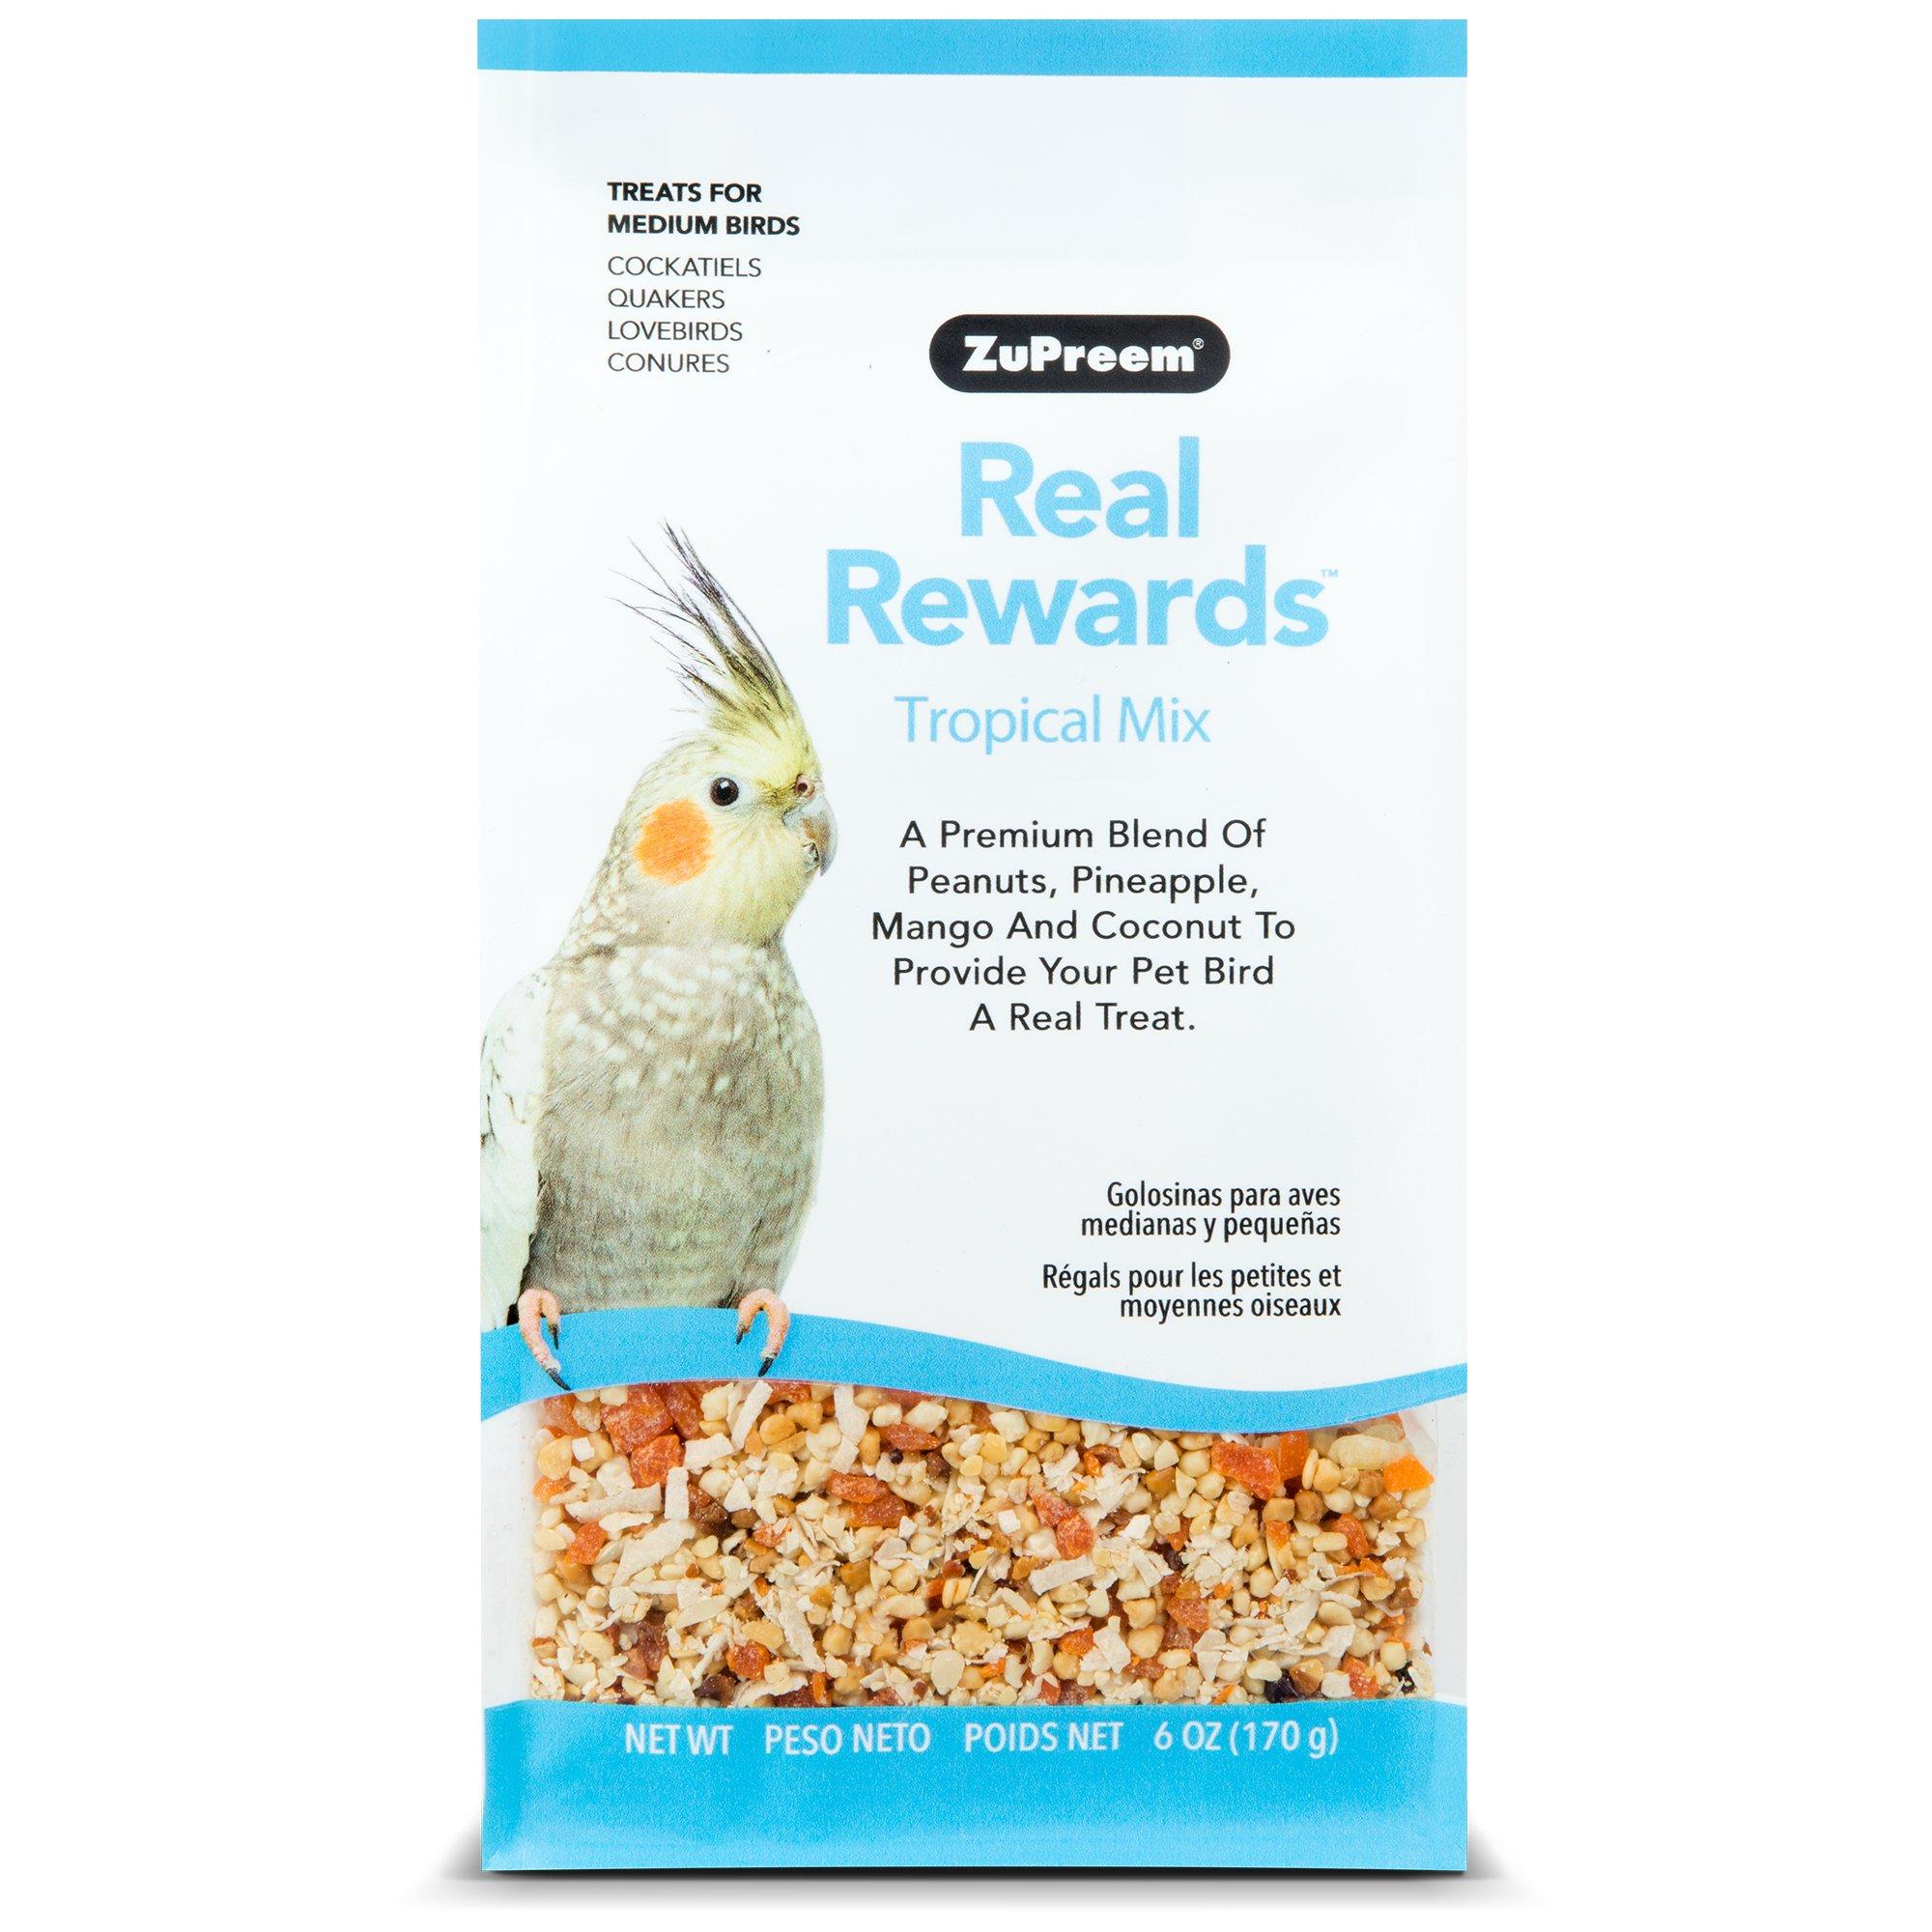 ZuPreem Real Rewards Tropical Mix Treats for Medium Birds